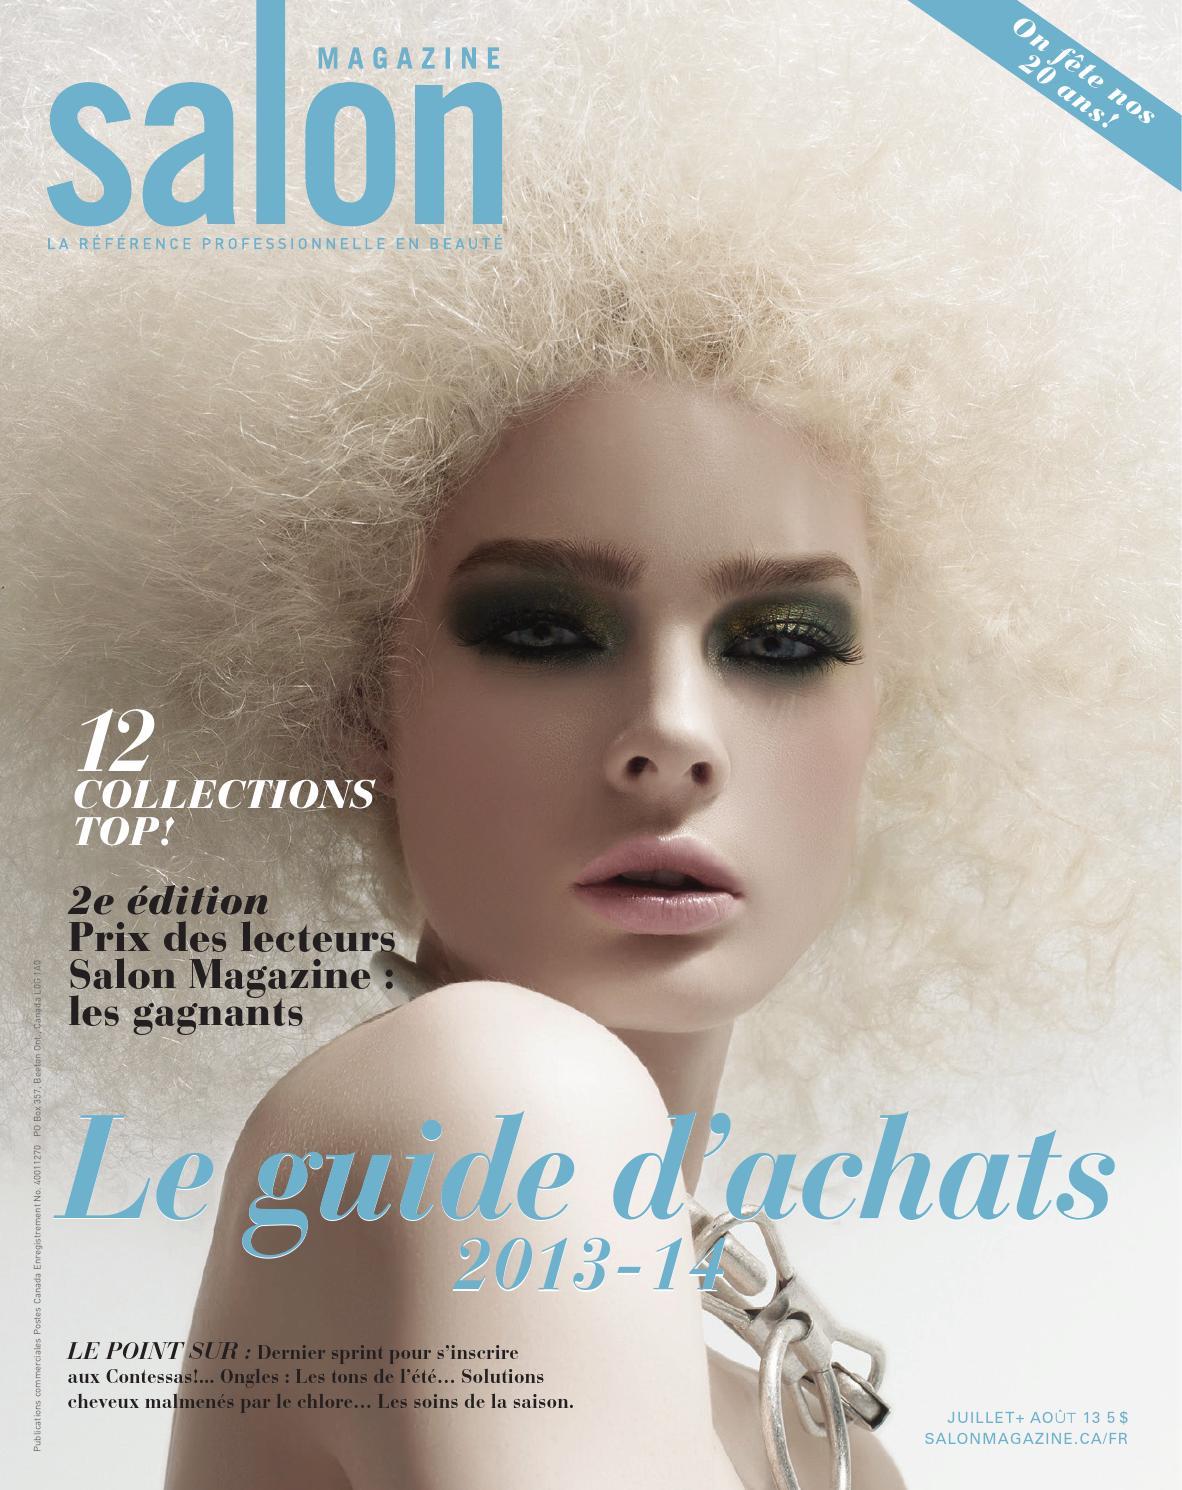 Hair amp nail choices aiibeauty - Salon Magazine Dition Fran Ais Juillet Ao T 2013 By Salon Communications Inc Issuu